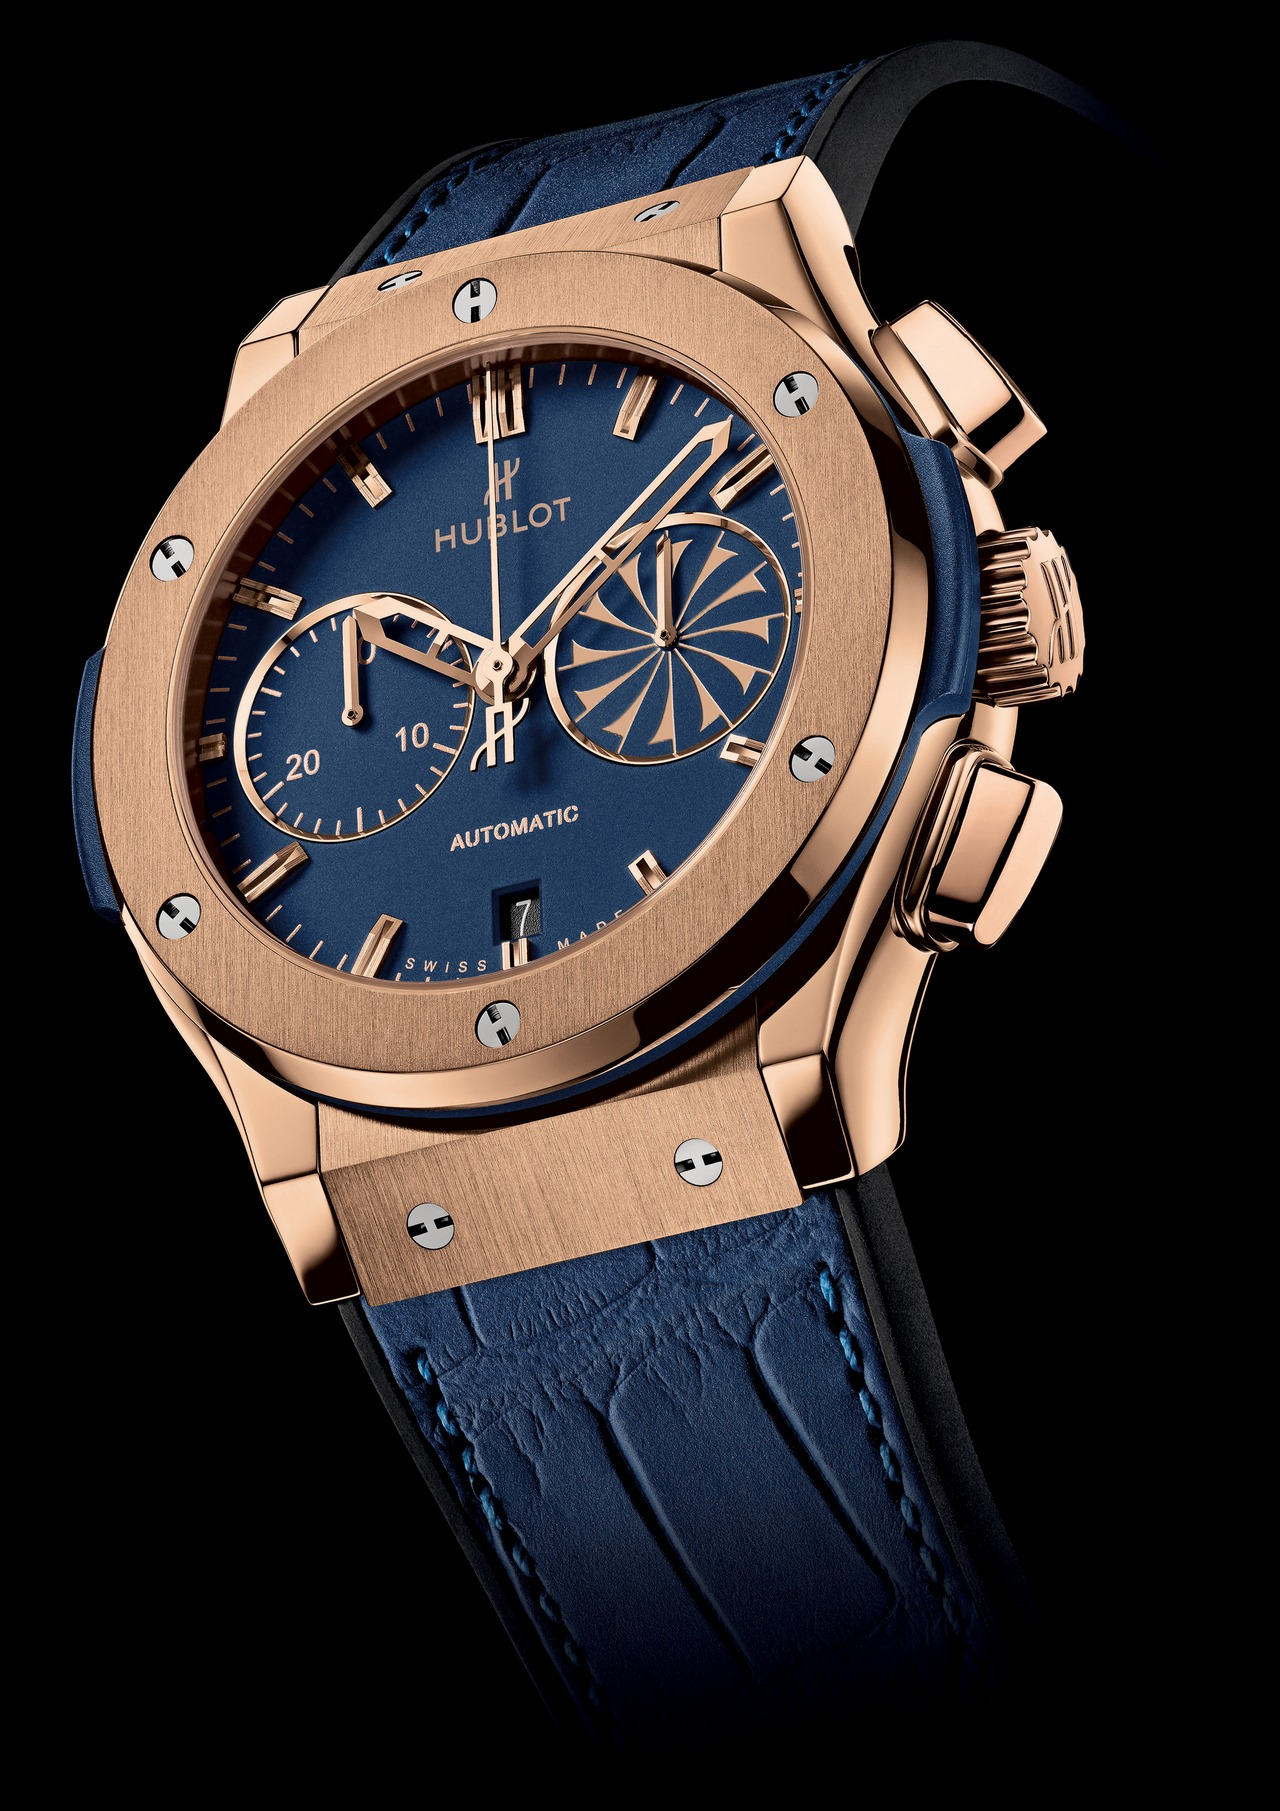 hublot-cronografo-classic-fusion-mykonos-2013_0-100_5